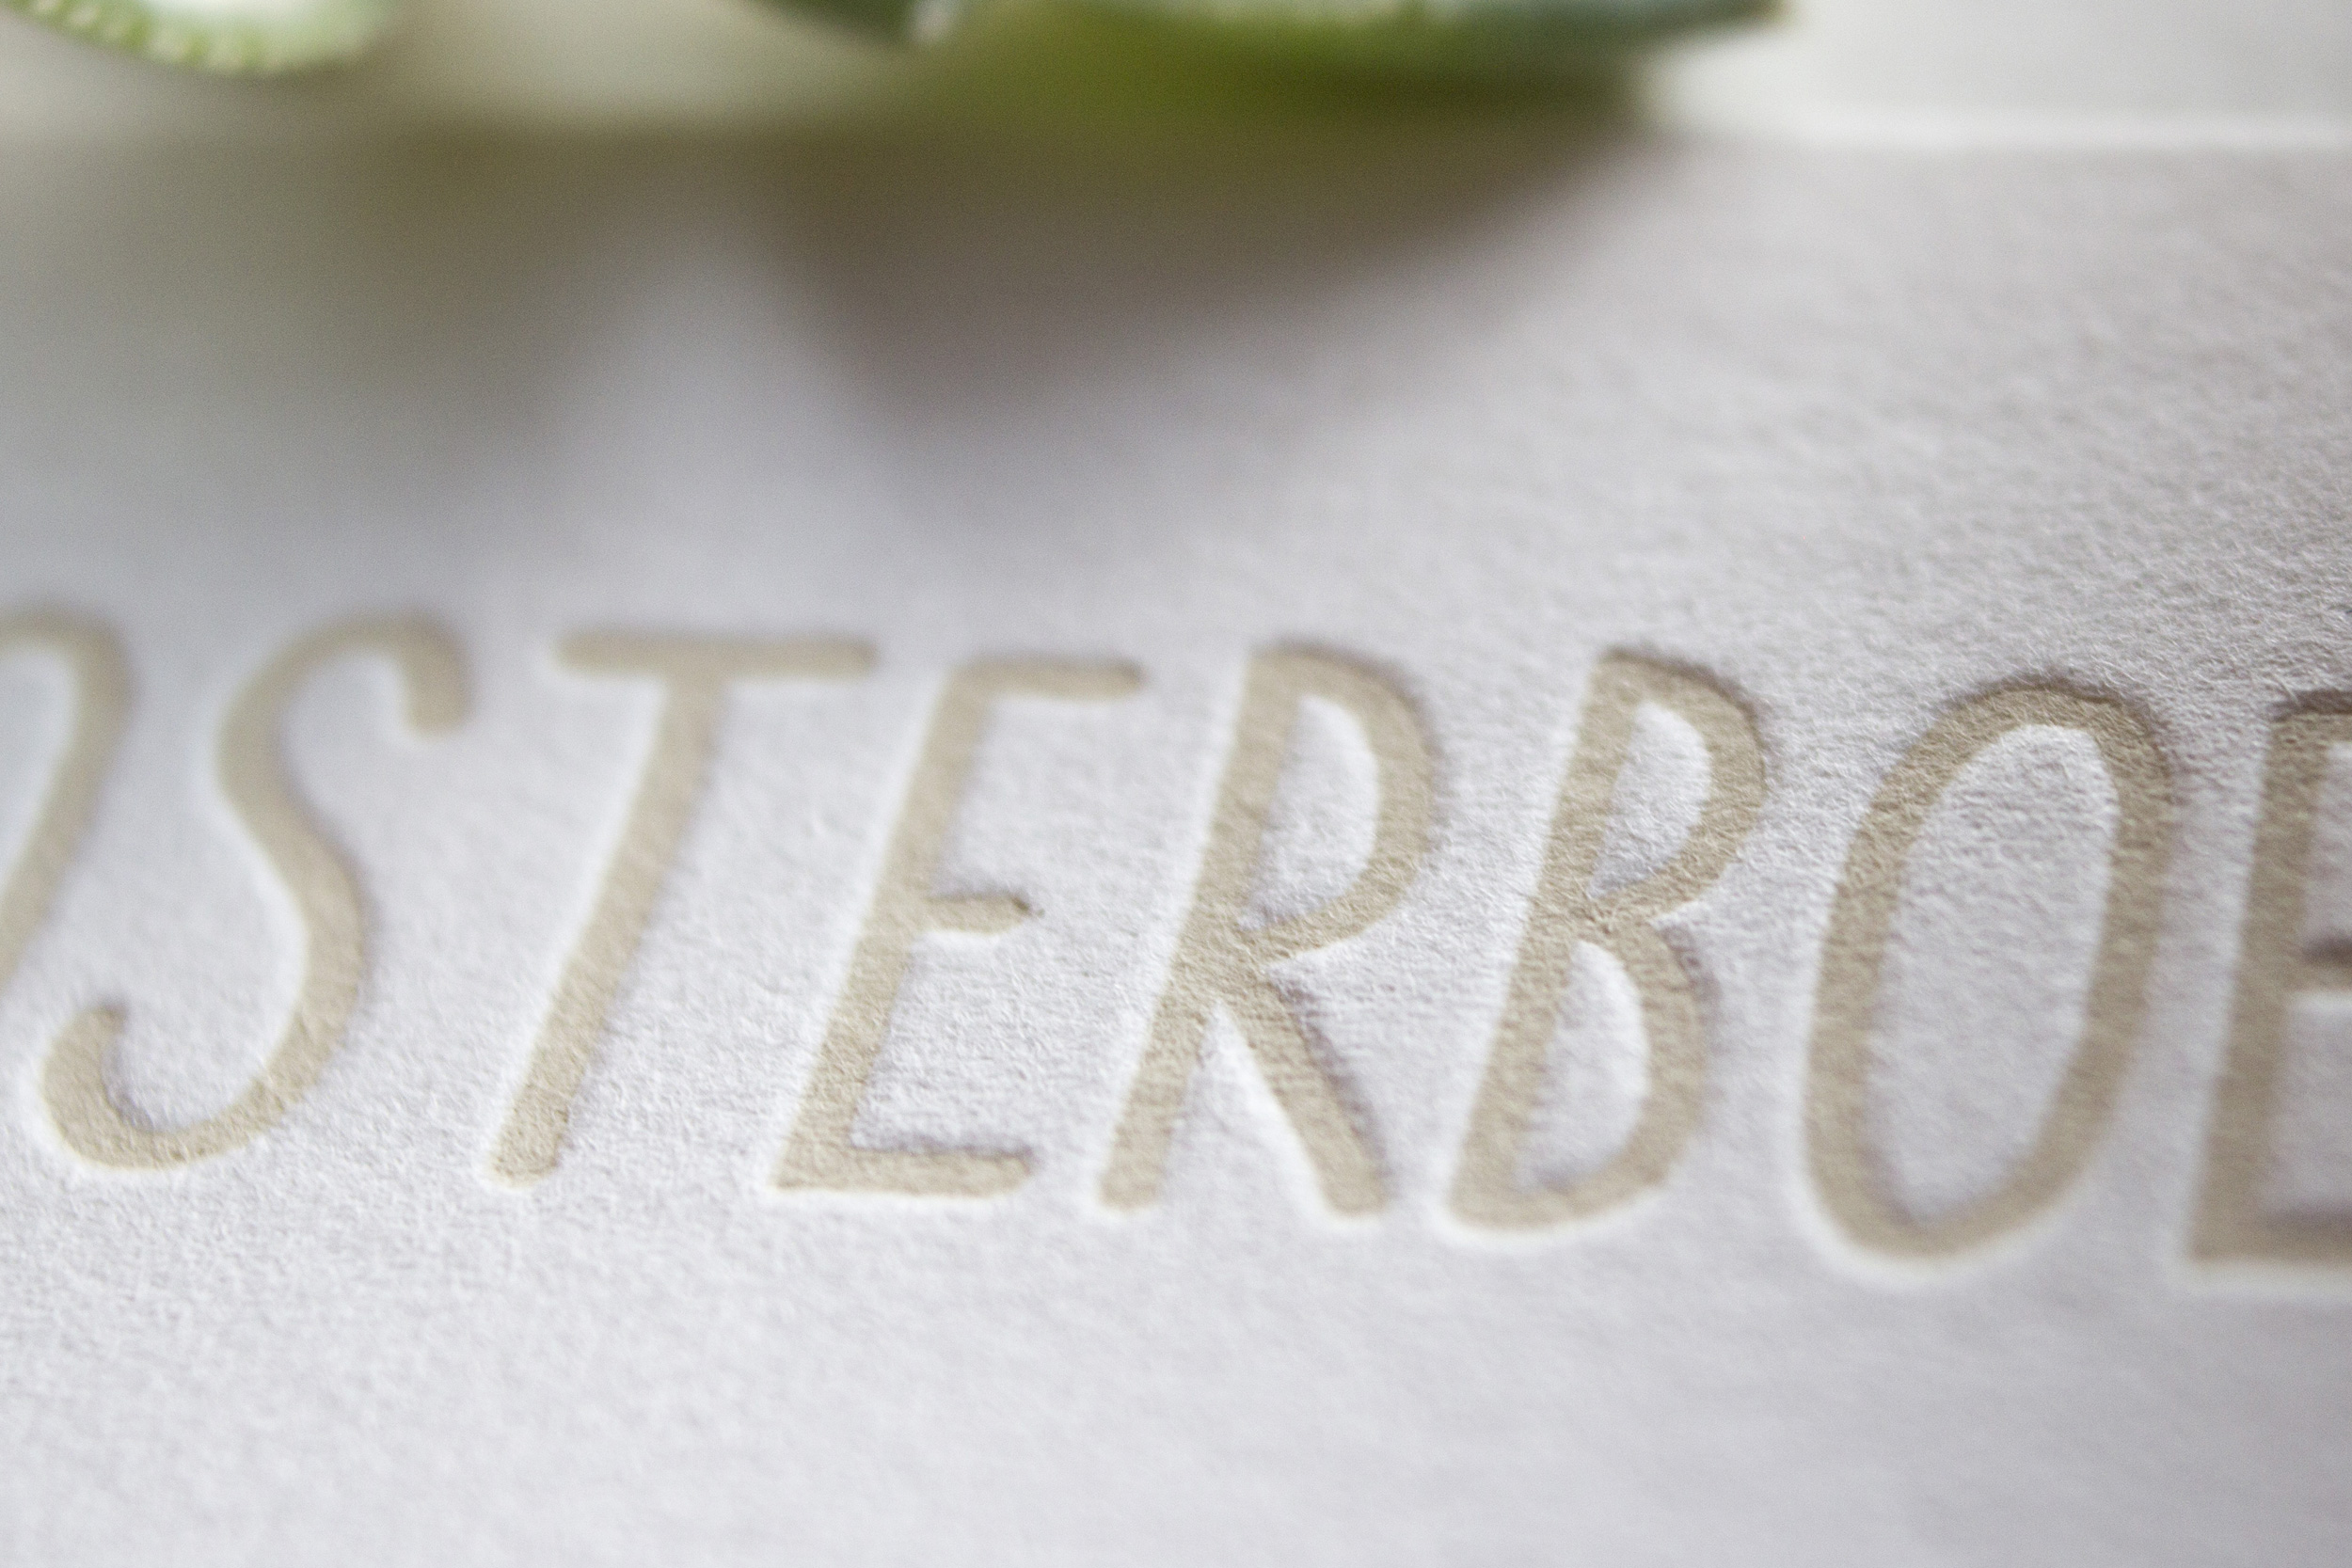 tarjetas-invitaciones-2-marcela-klosterboer-papel-principal-letterpress-imprenta-tipografica-1.jpg